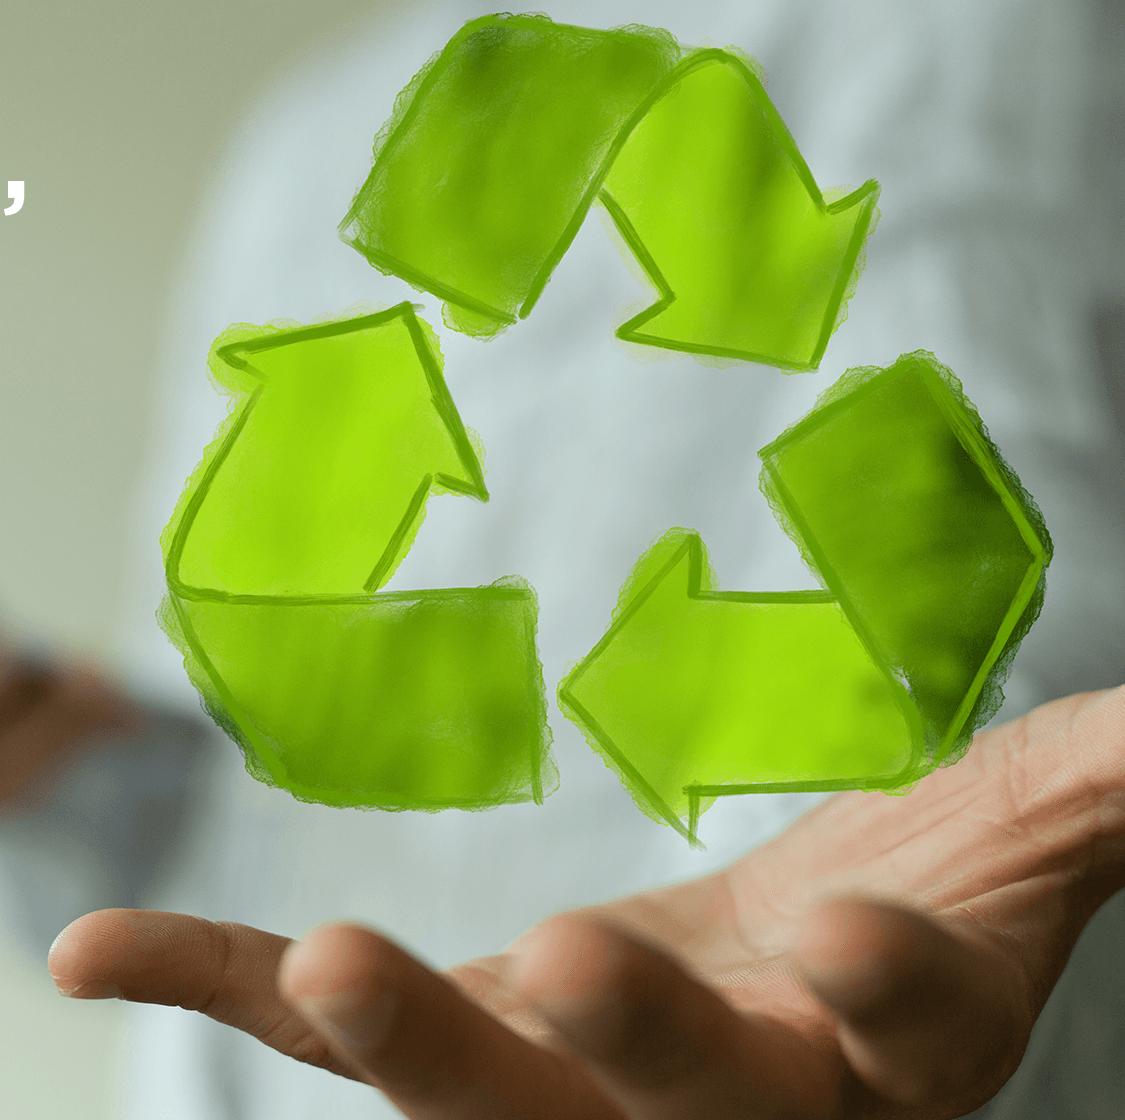 EuRIC Recyclers' Talks #1: Economia circulara